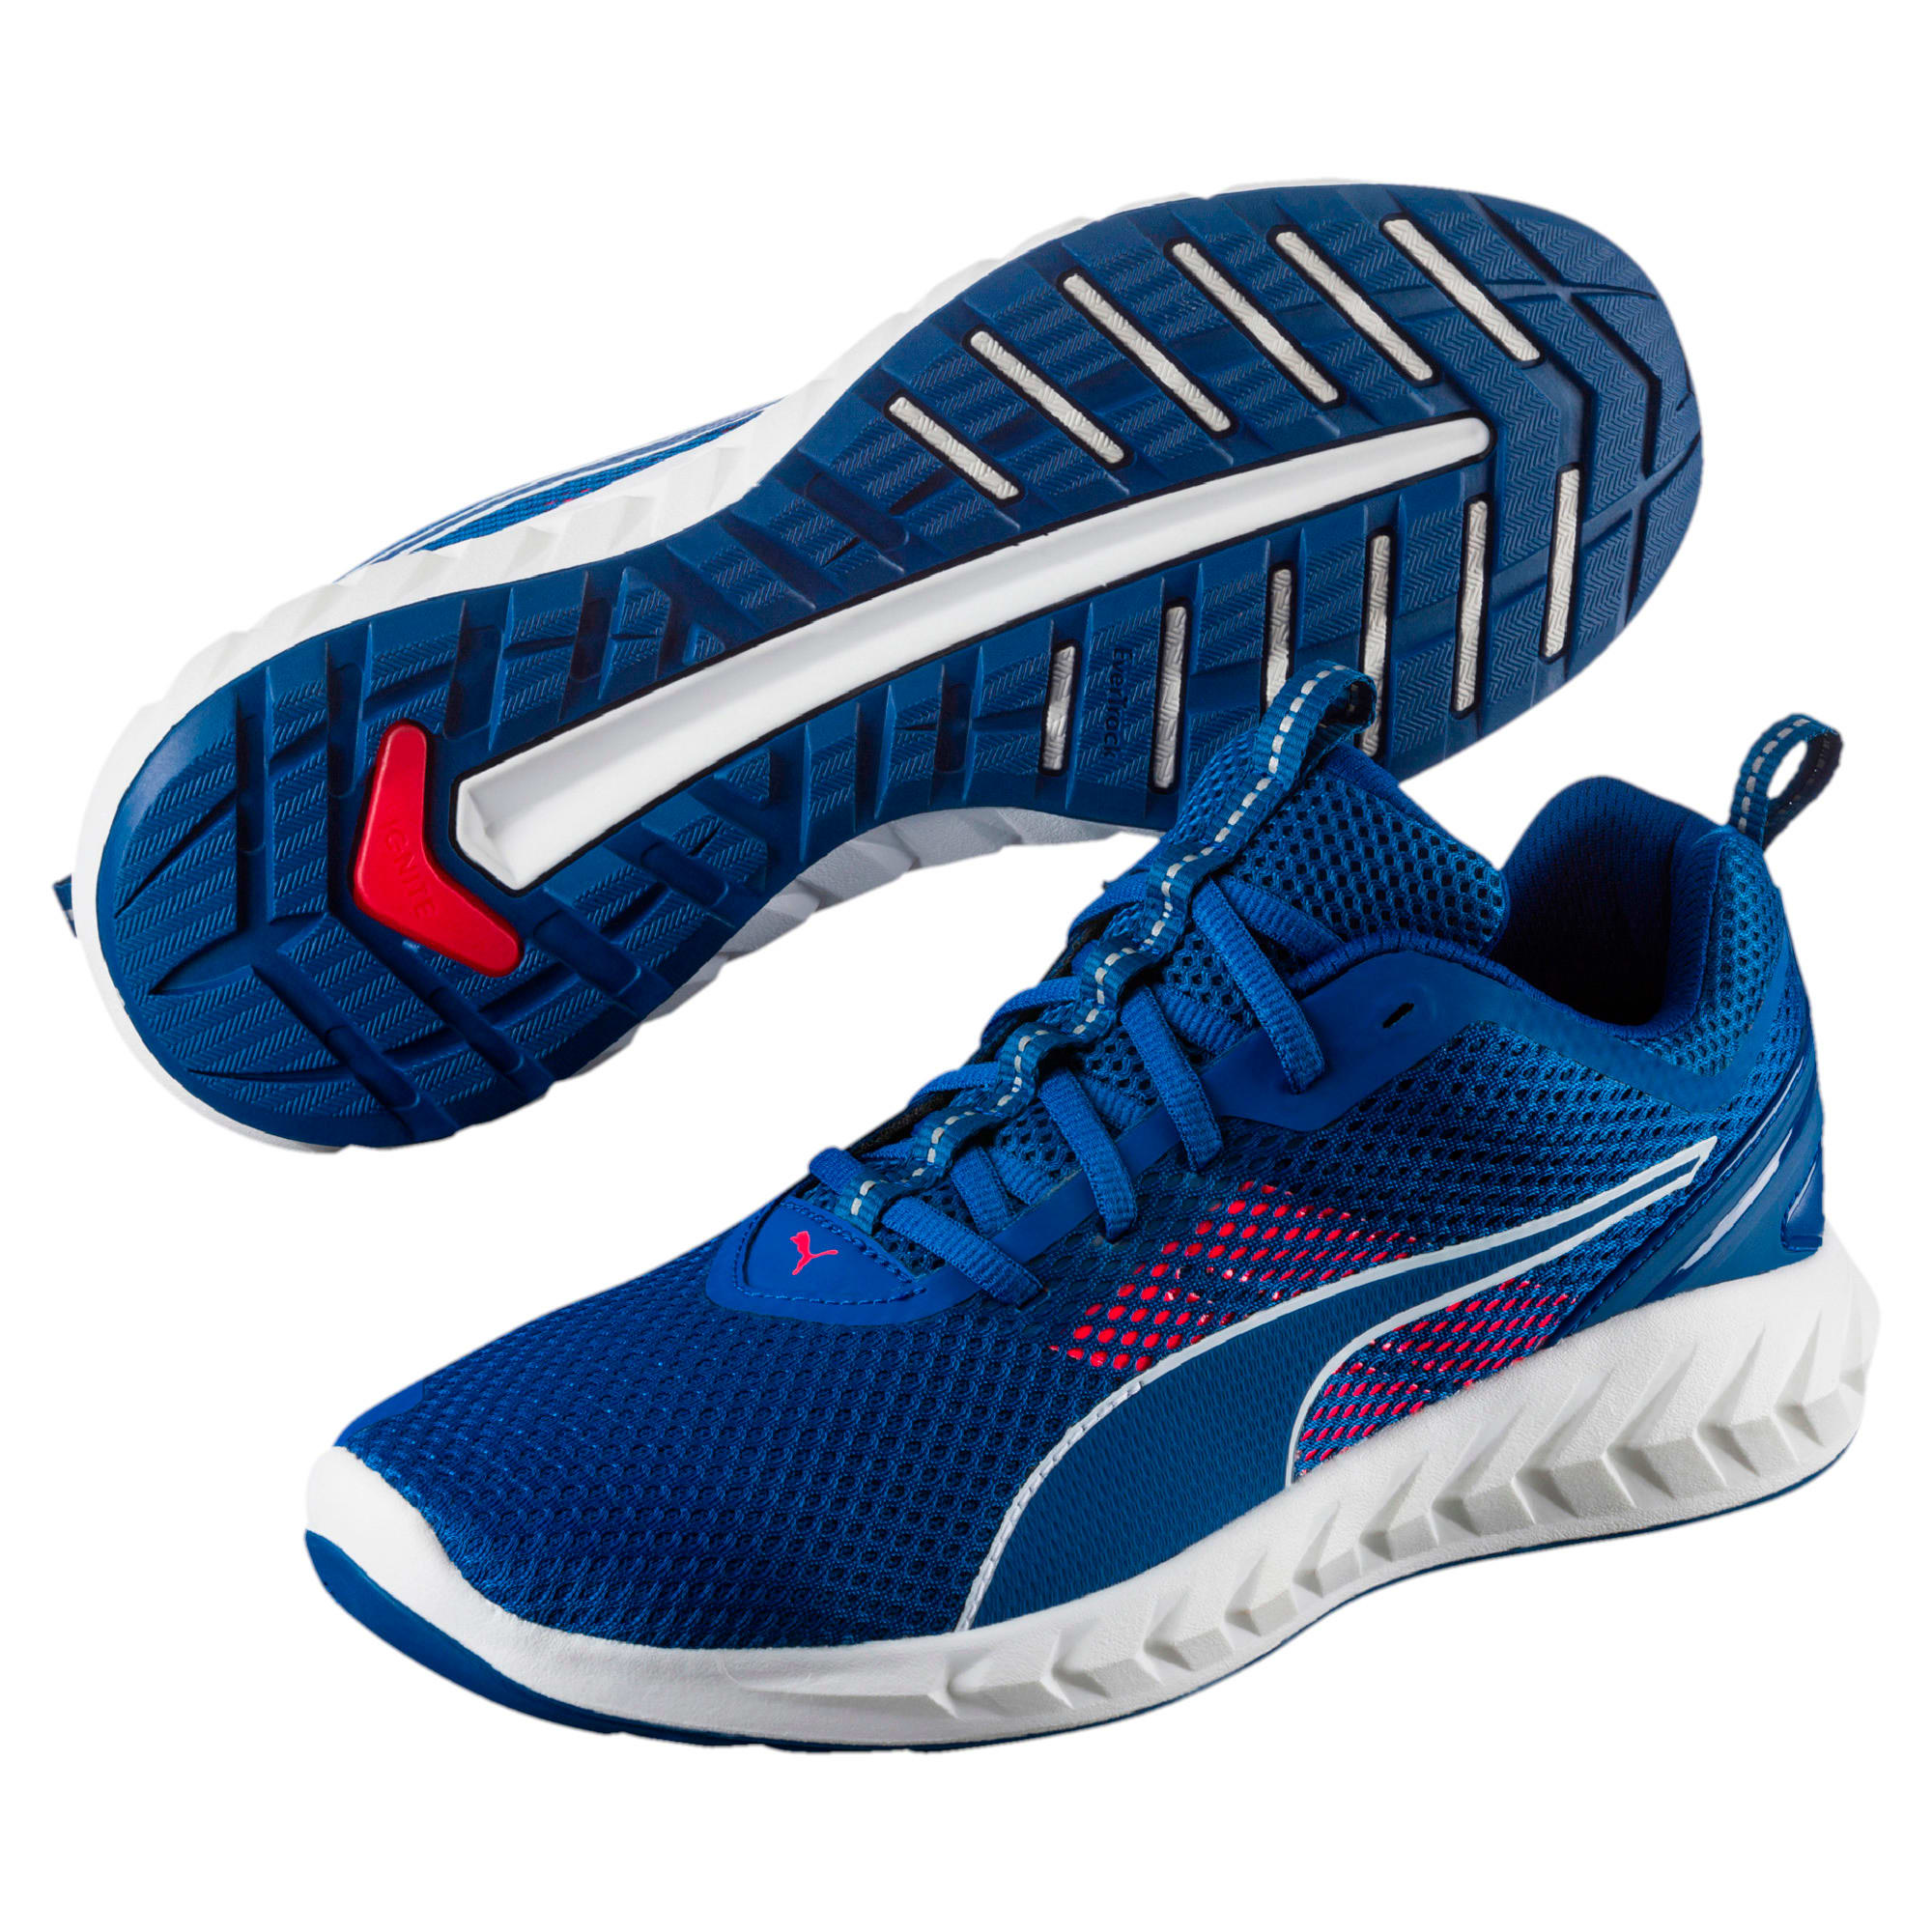 Thumbnail 6 of IGNITE Ultimate 2 Men's Running Shoes, TRUE BLUE-Bright Plasma, medium-IND